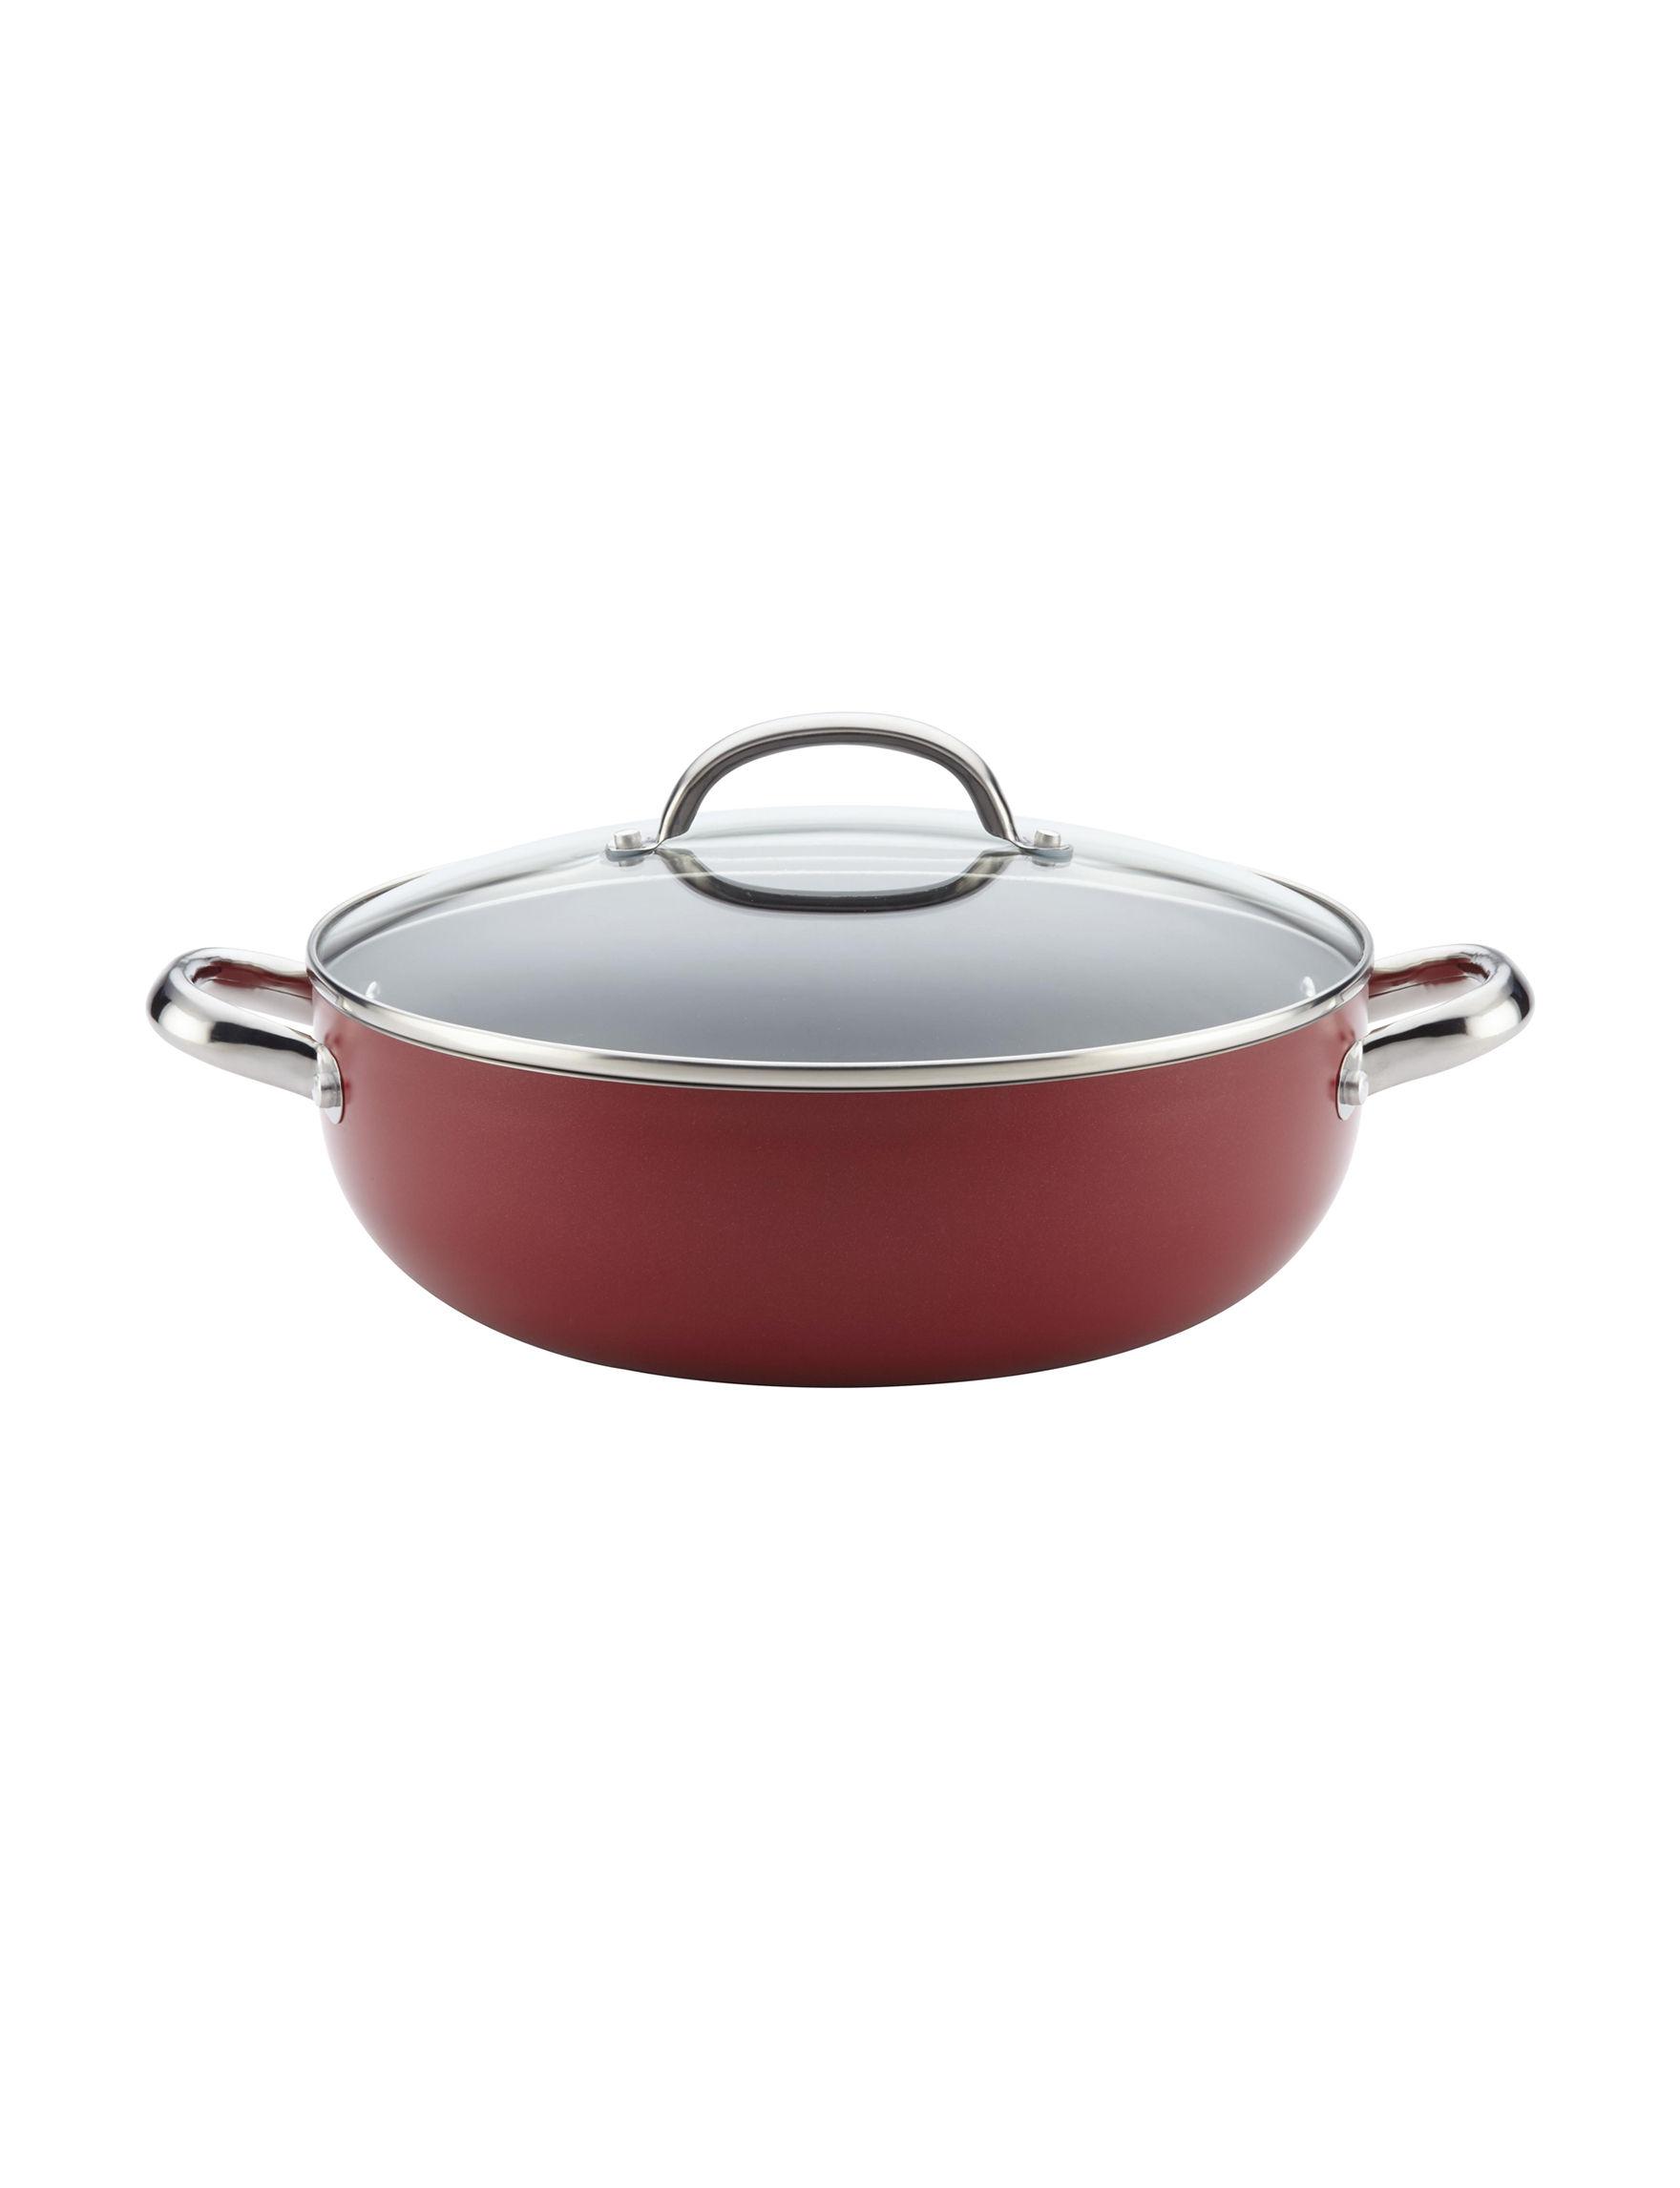 Farberware Dark Red Frying Pans & Skillets Cookware